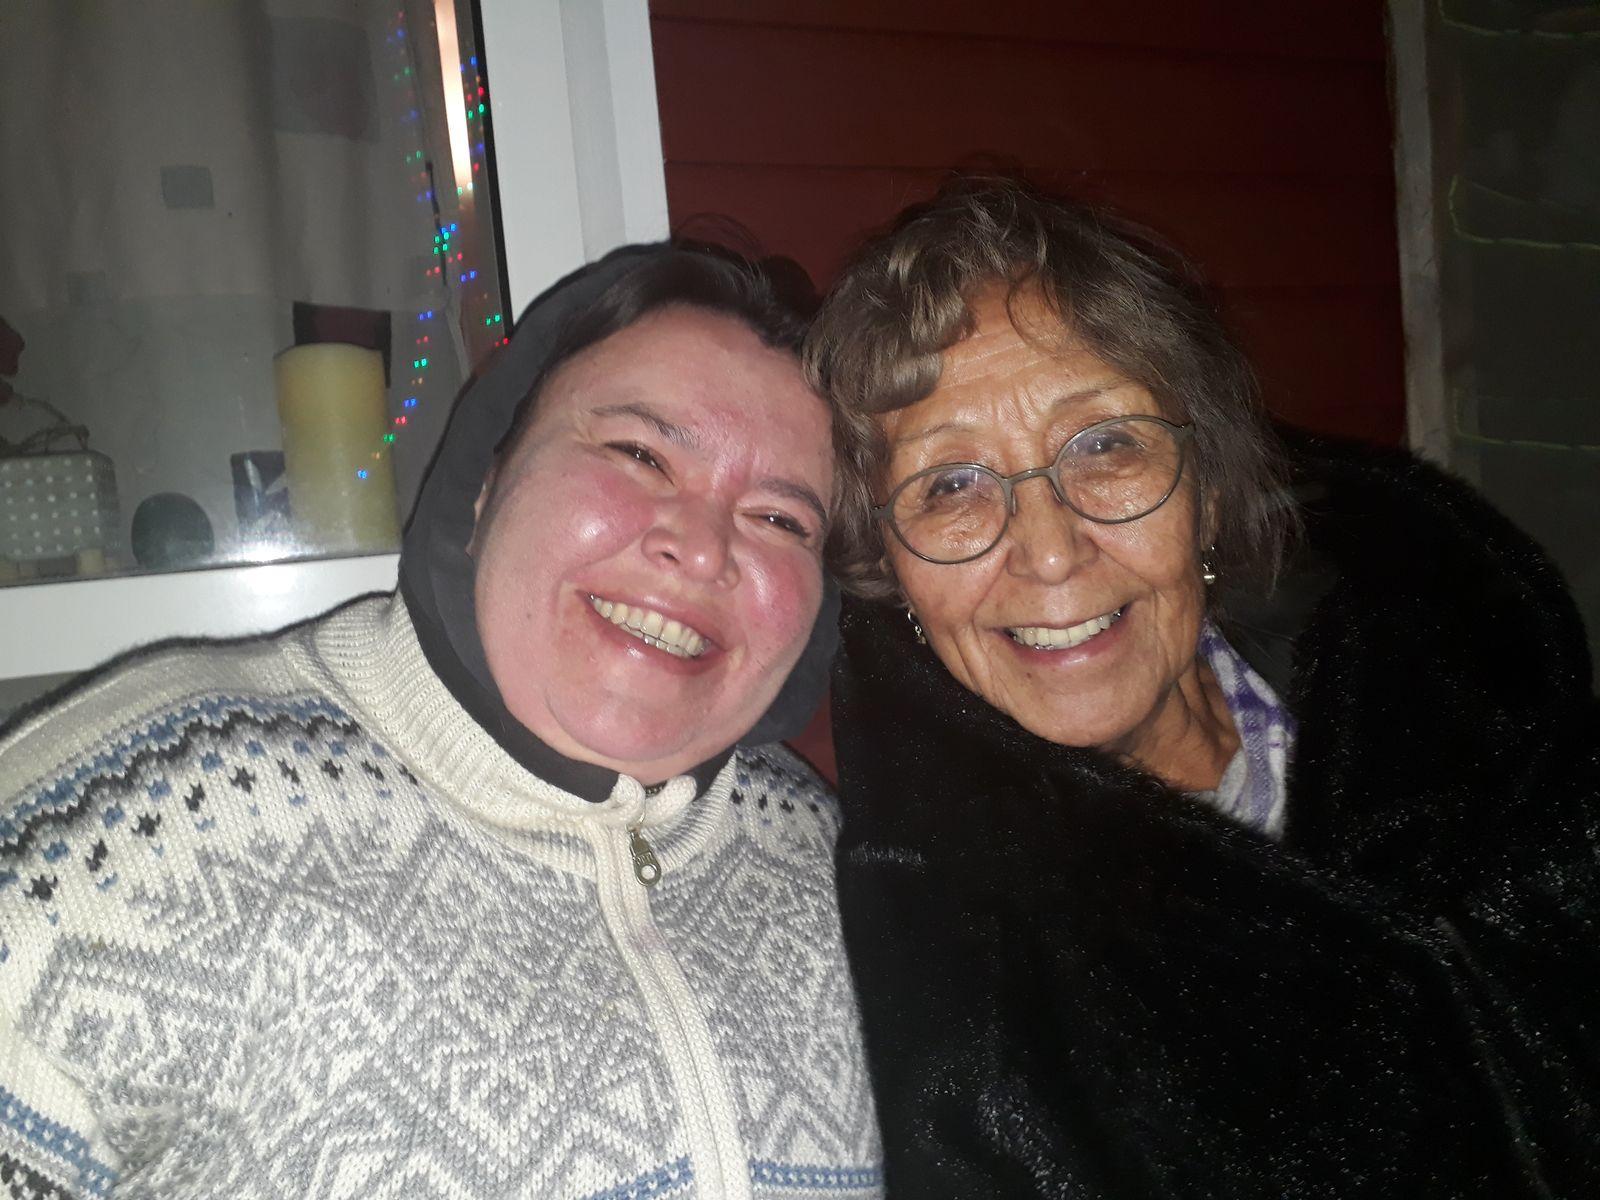 2020-01-16-2213_Anna-Hessler-Labansen-Sofie-Potter